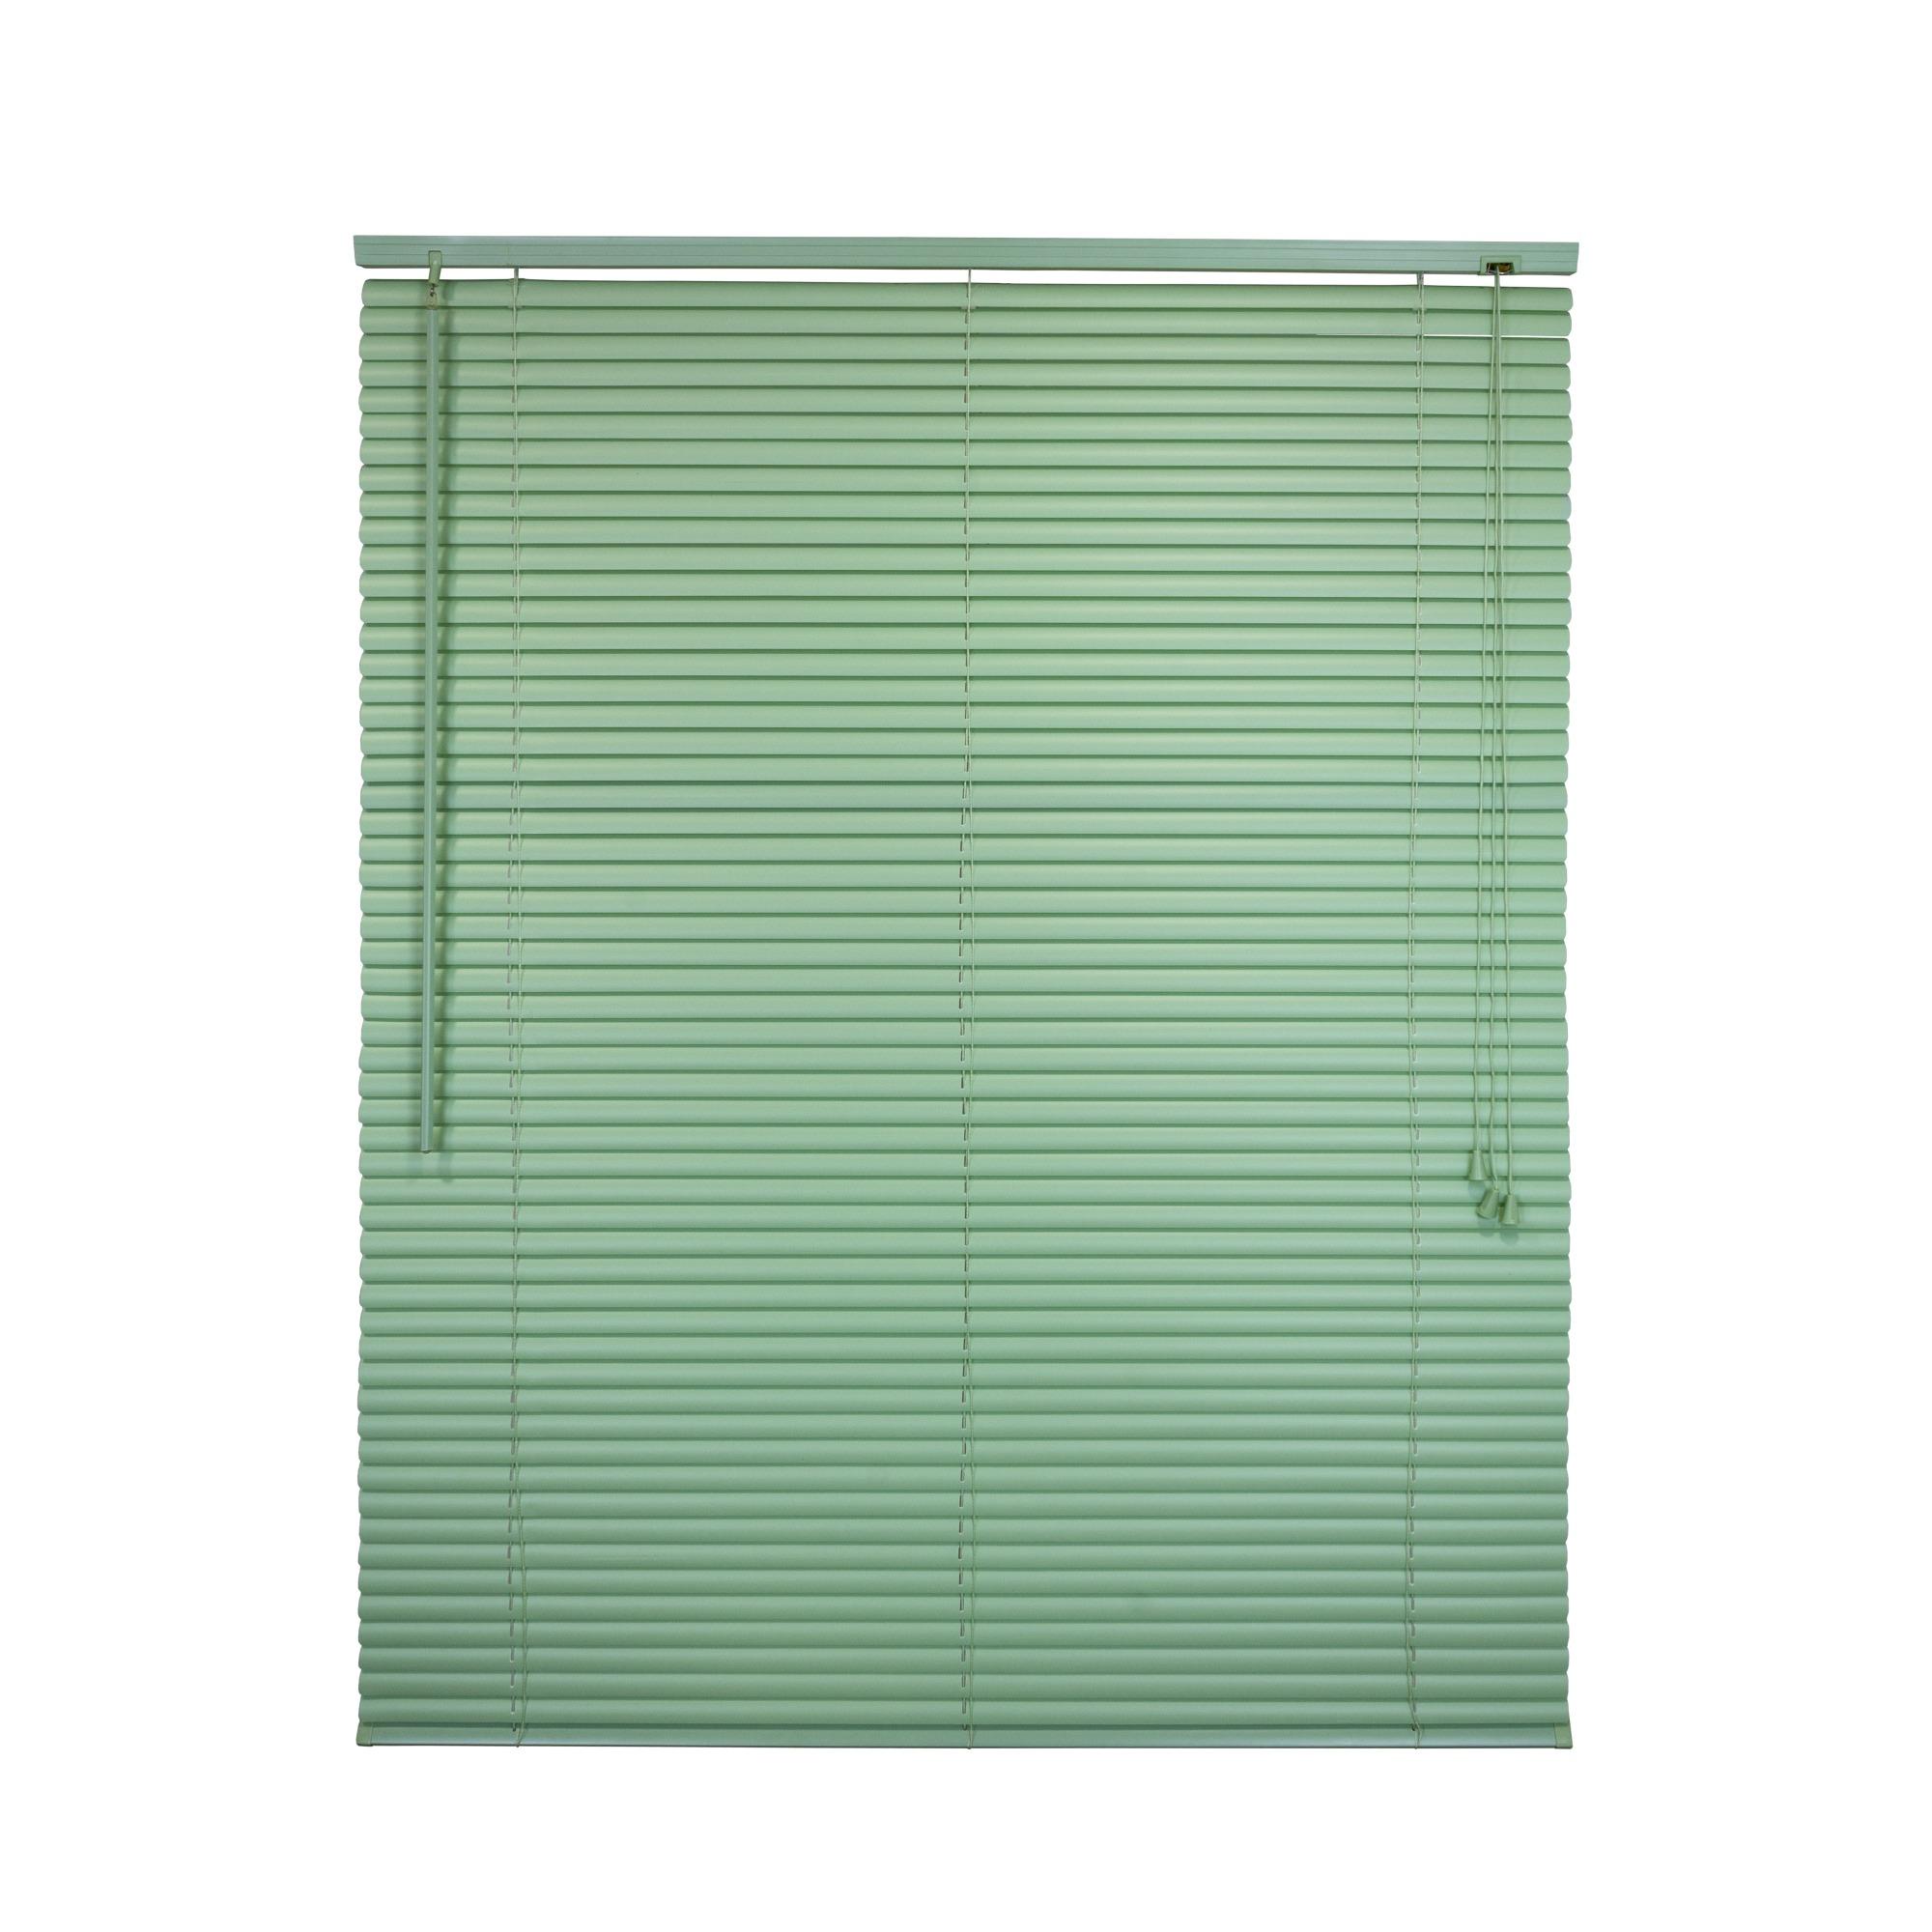 Persiana Horizontal PVC 100x125 cm Verde - Liyang